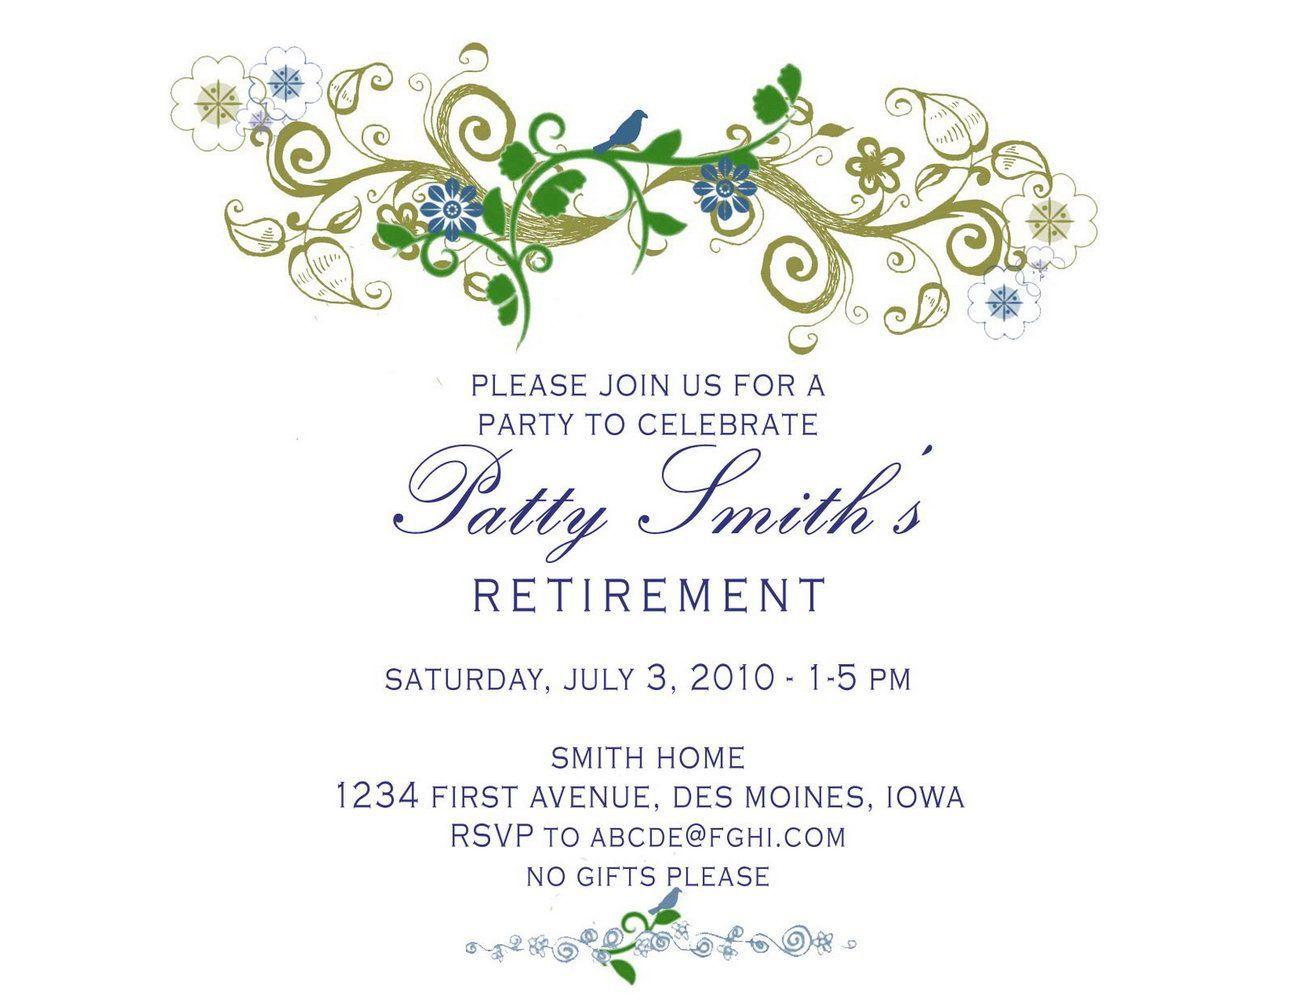 005 Sensational Retirement Party Invitation Template Photo  Templates For Free Nurse M WordFull